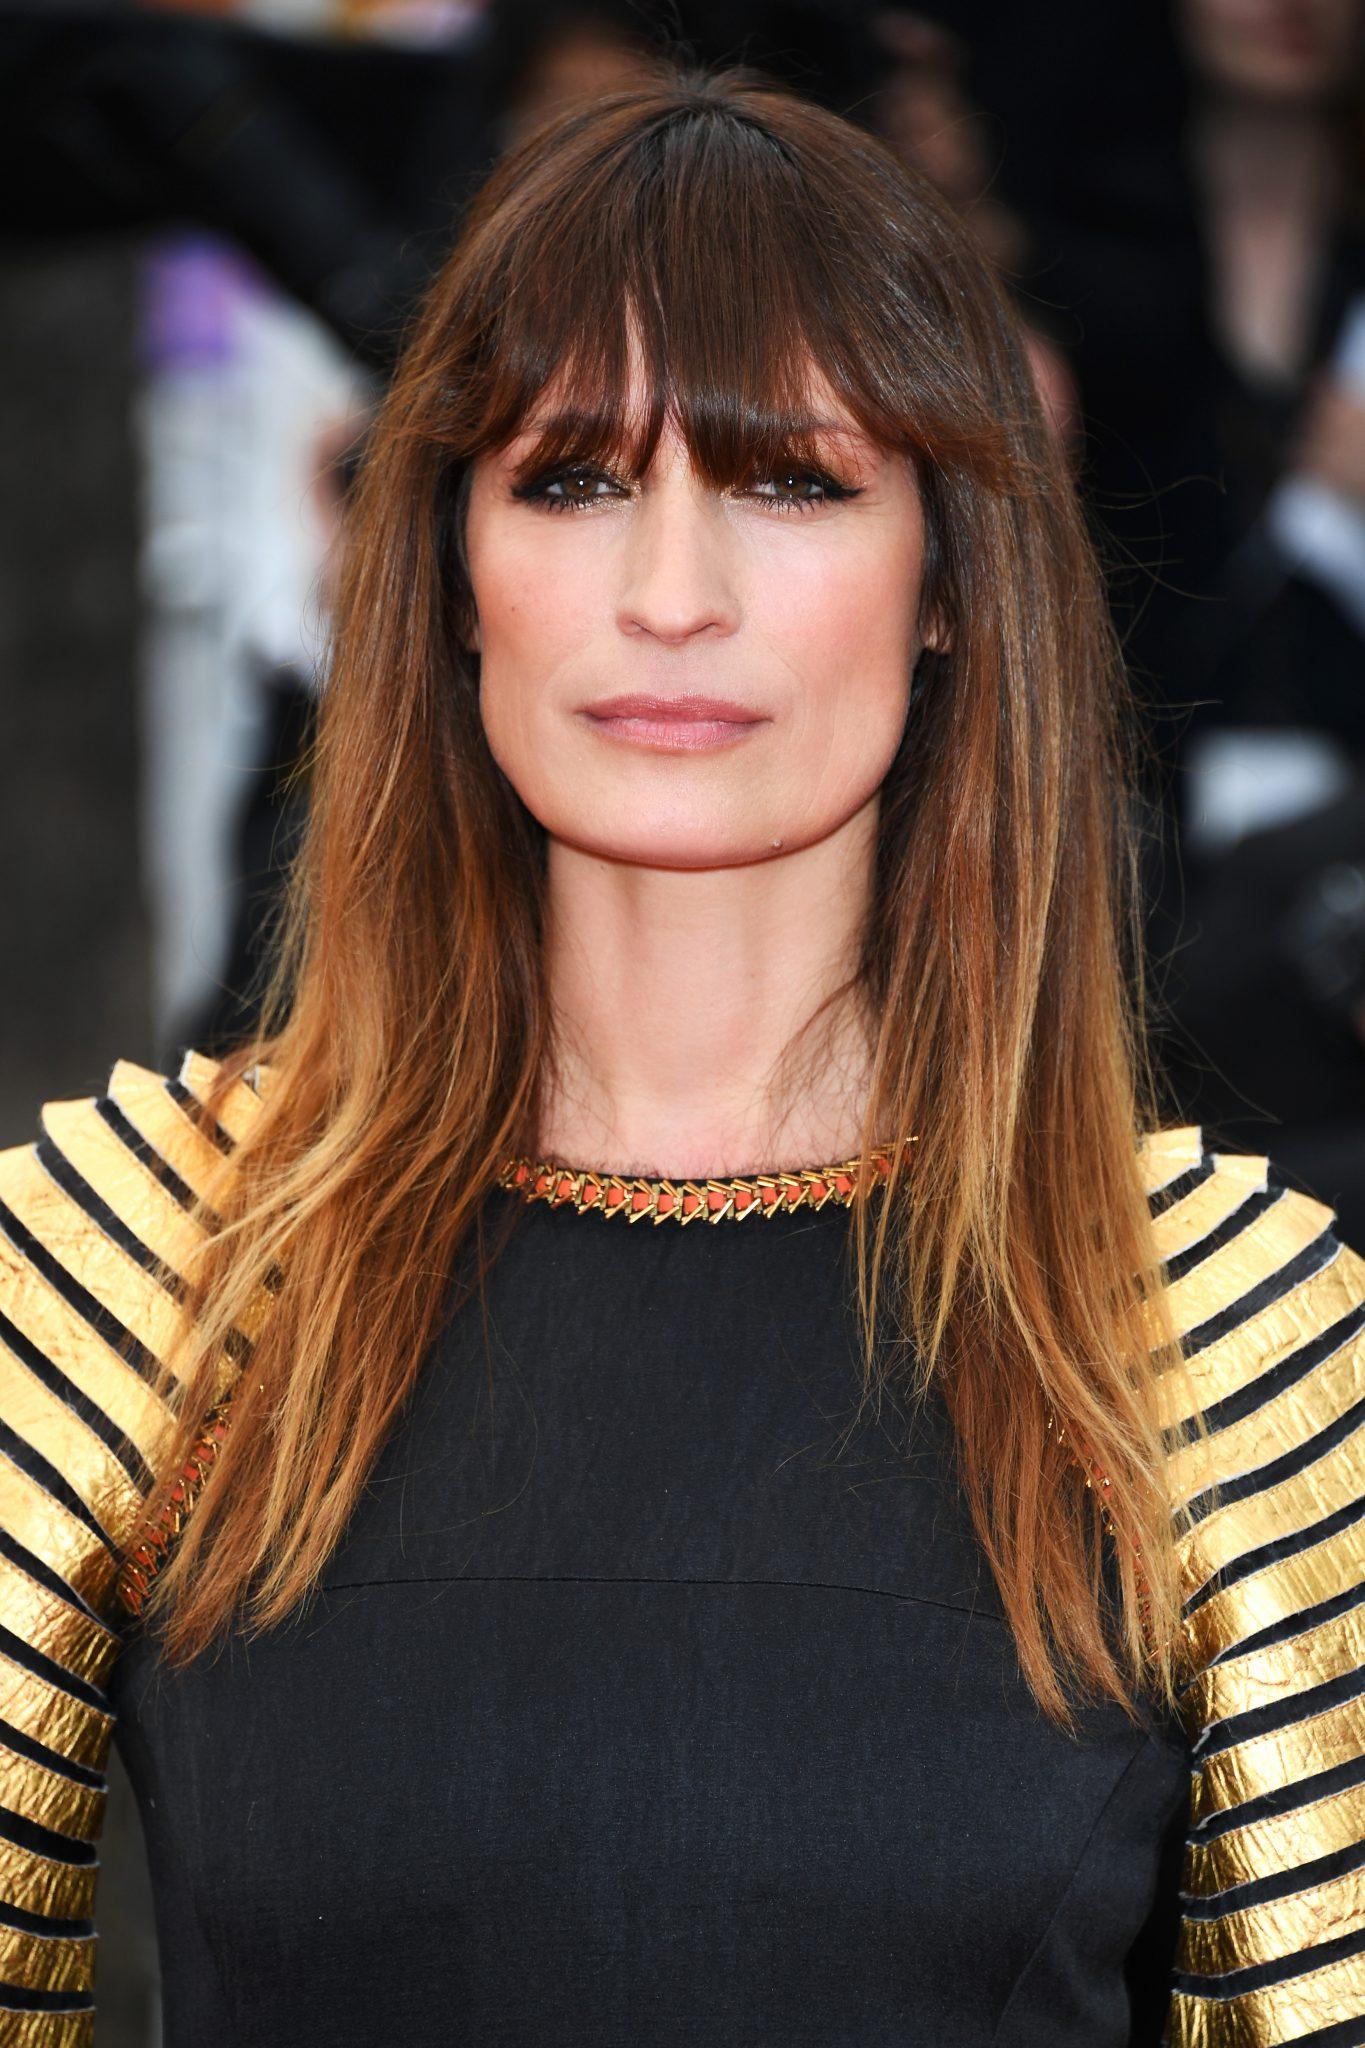 CHANEL Cannes 2019 Caroline de Maigret Esprit de Gabrielle espritdegabrielle.com